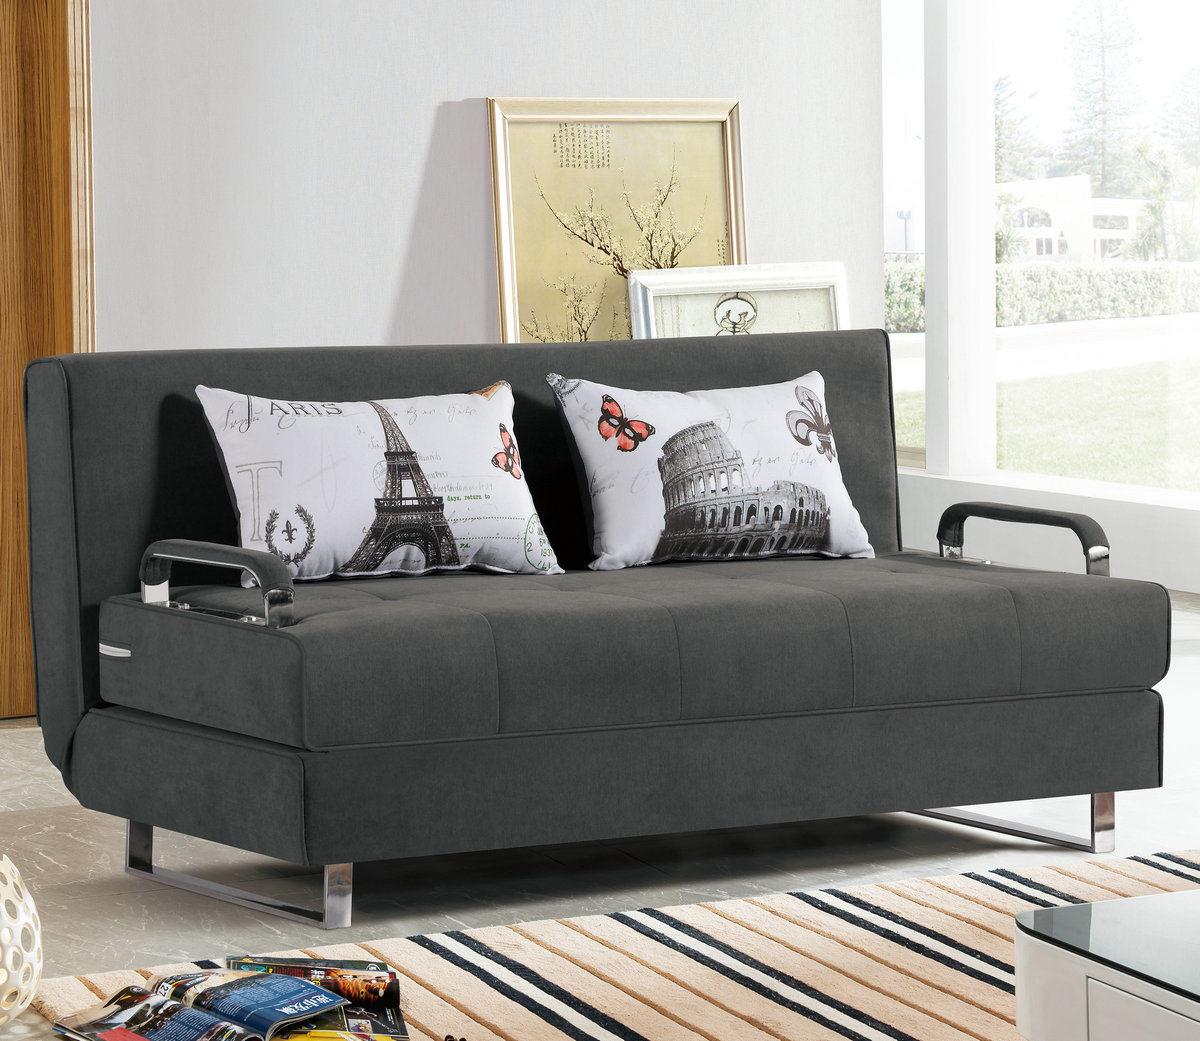 [Hot Item] Dark Grey Color Natural Cotton Fabric Sofa Bed for Apartment  Furniture (1807)